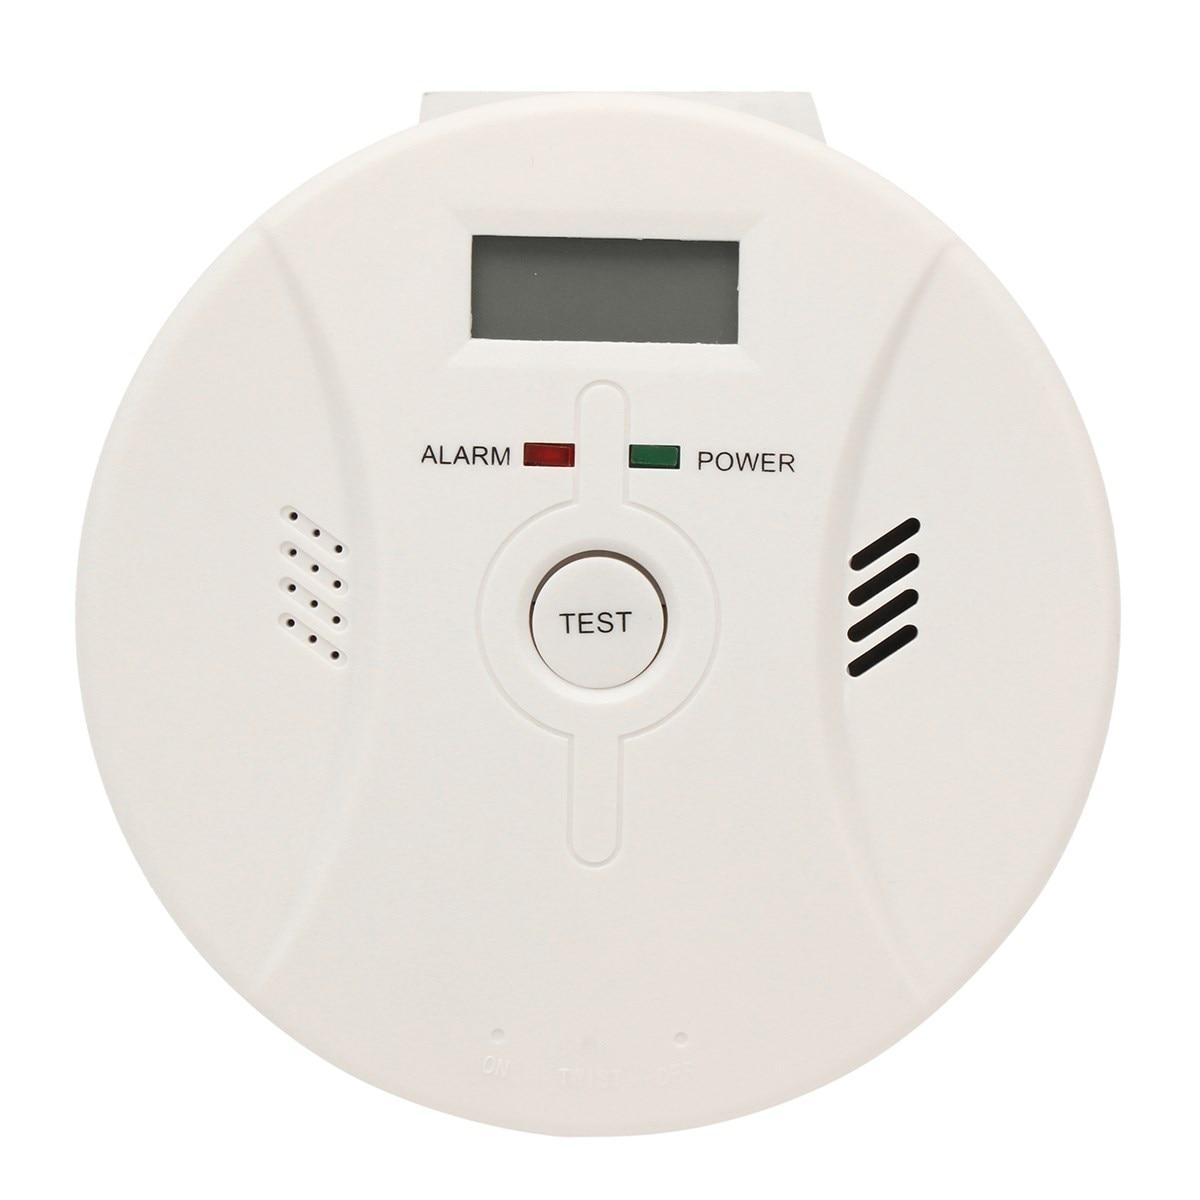 цена на Safurance Digital LCD CO Carbon Monoxide Detector Poisoning Smoke Fire Alarm Warning Sensor For Home Security